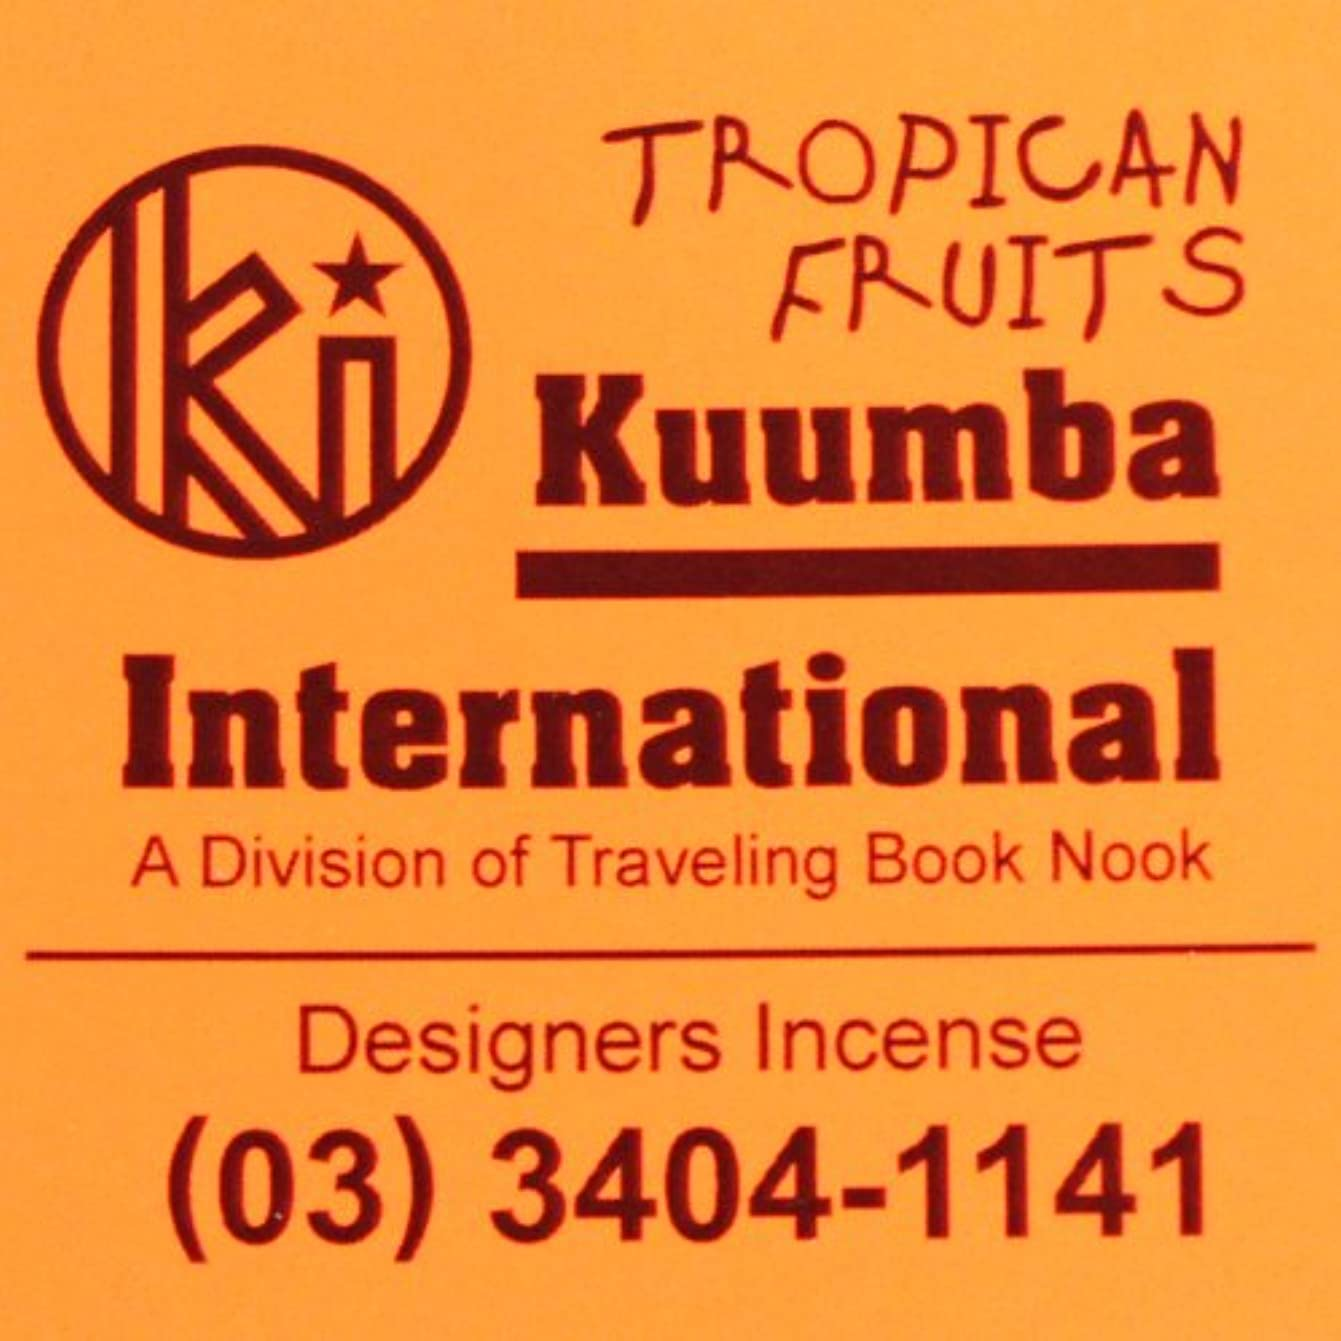 KUUMBA (クンバ)『incense』(TROPICAN FRUITS) (Regular size)